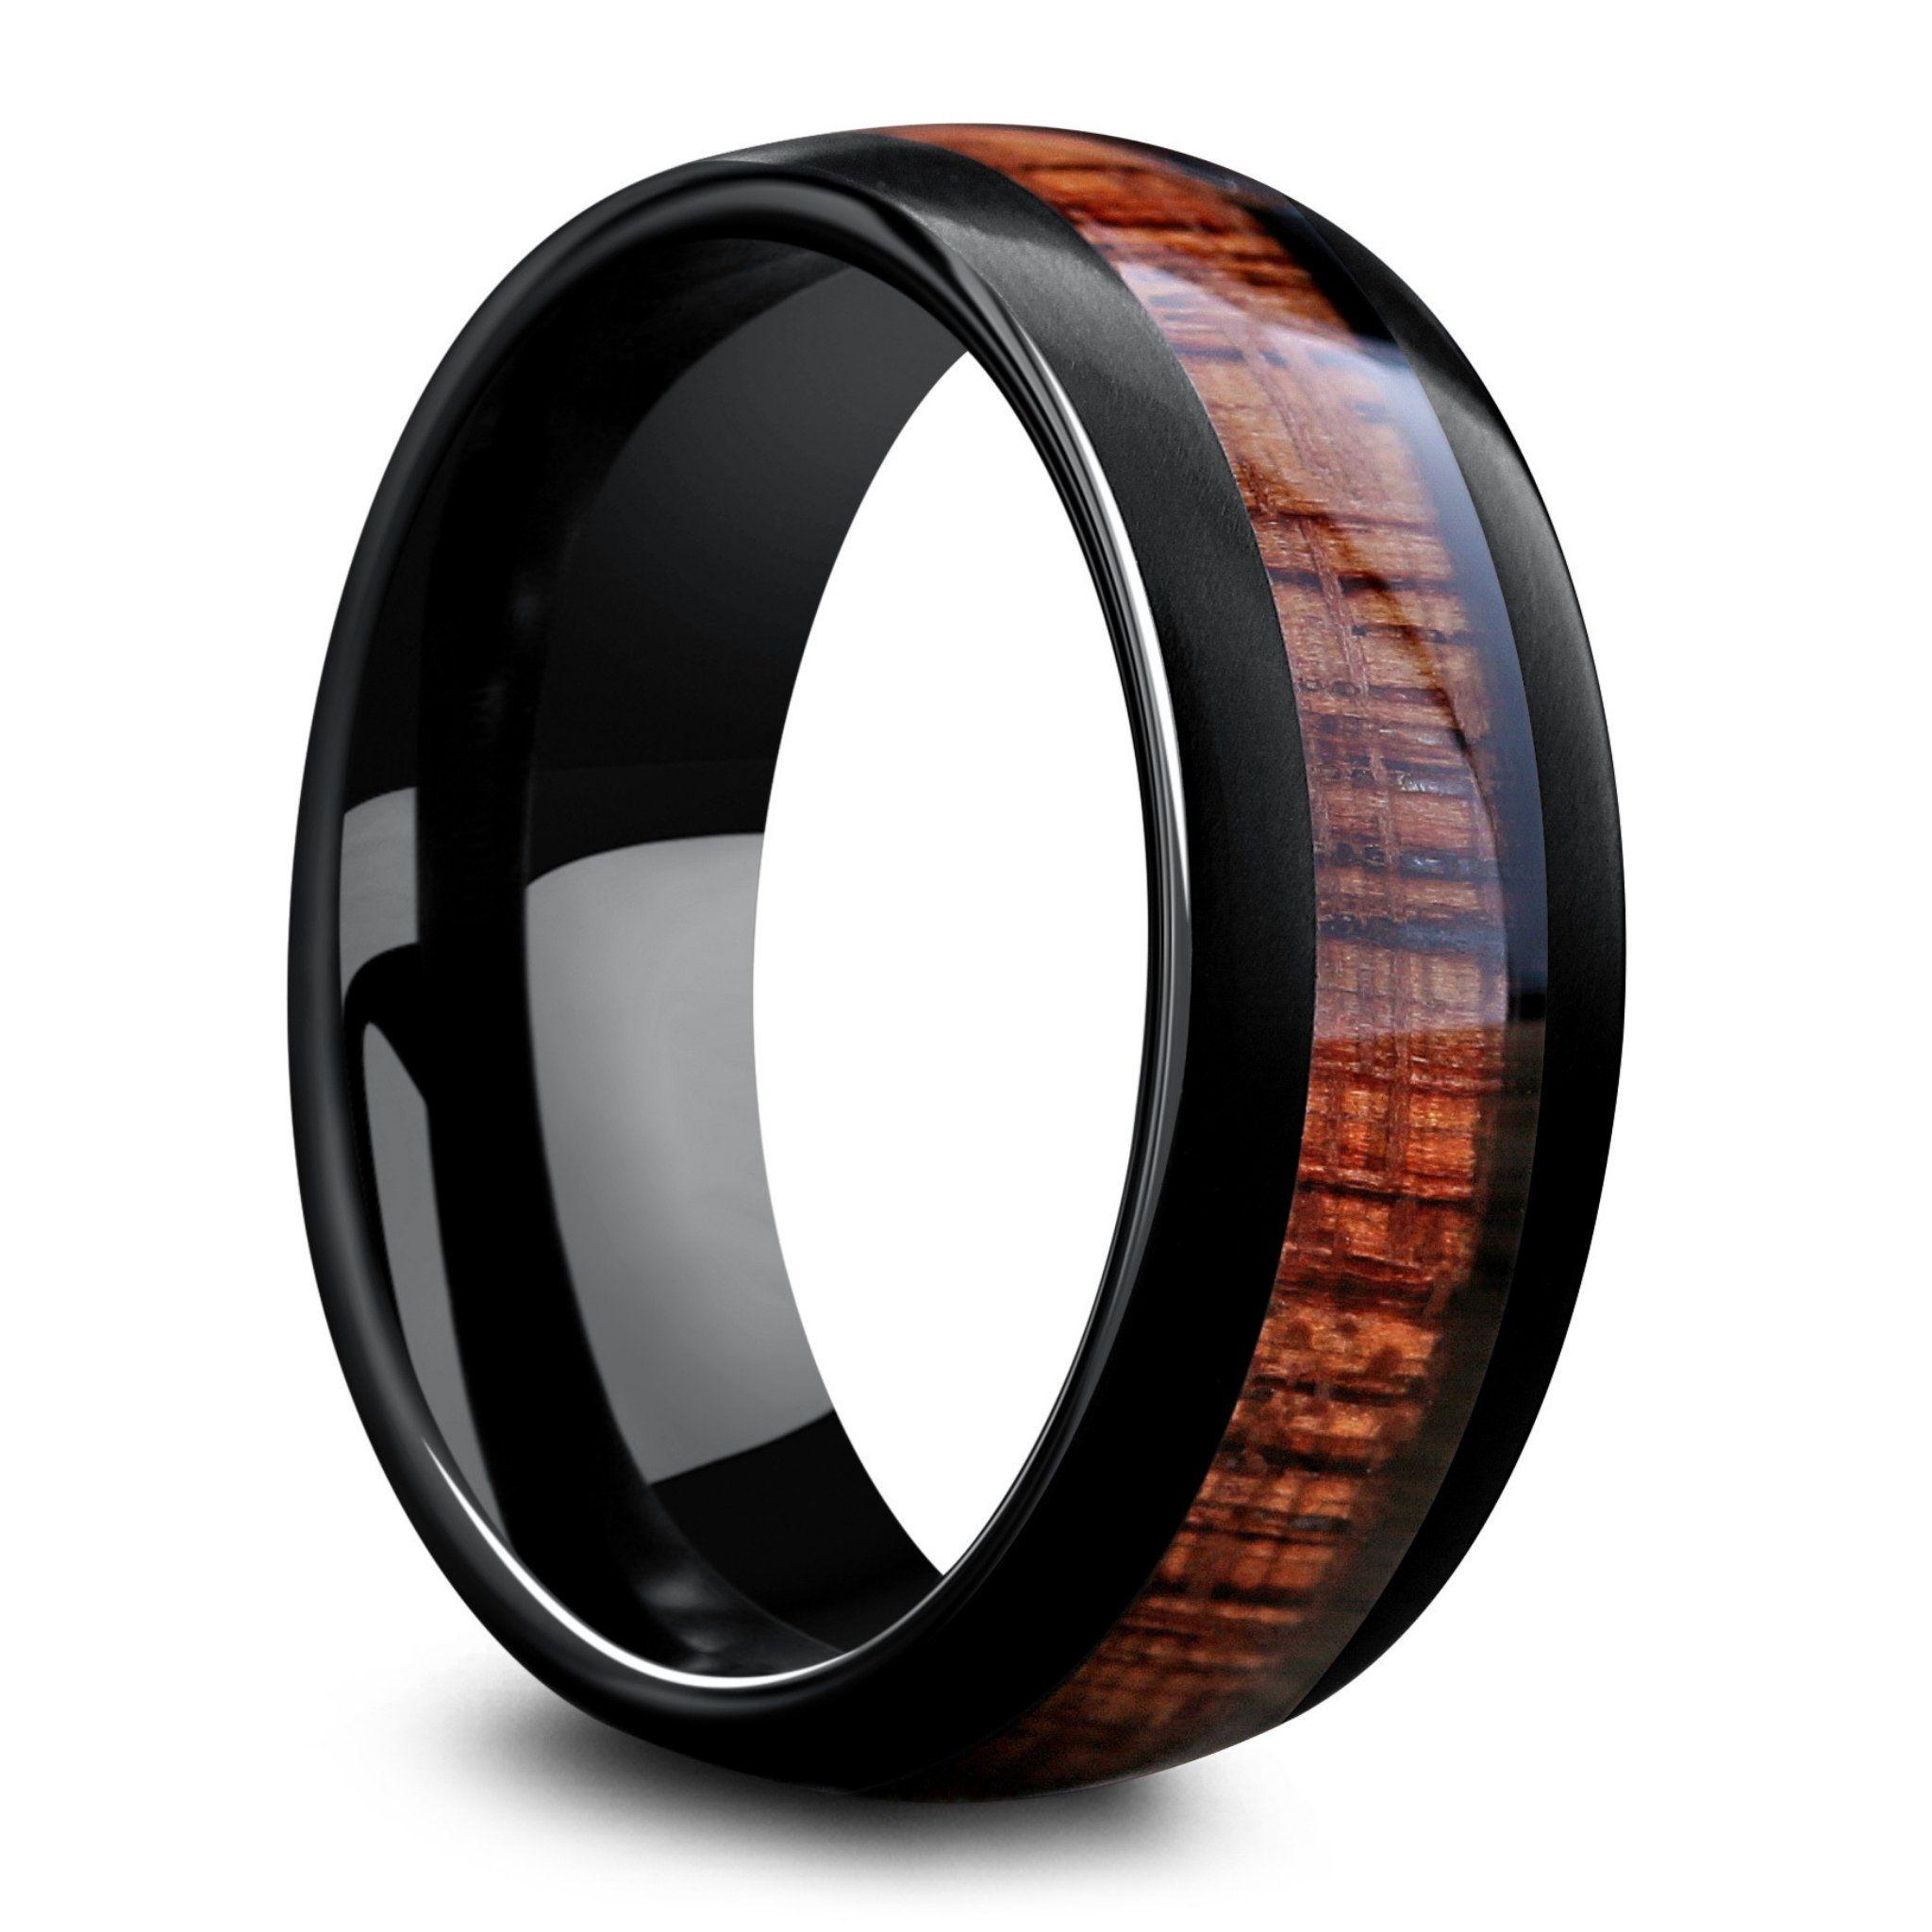 Banff Black Tungsten With Koa Wood Inlay in 2020 Black